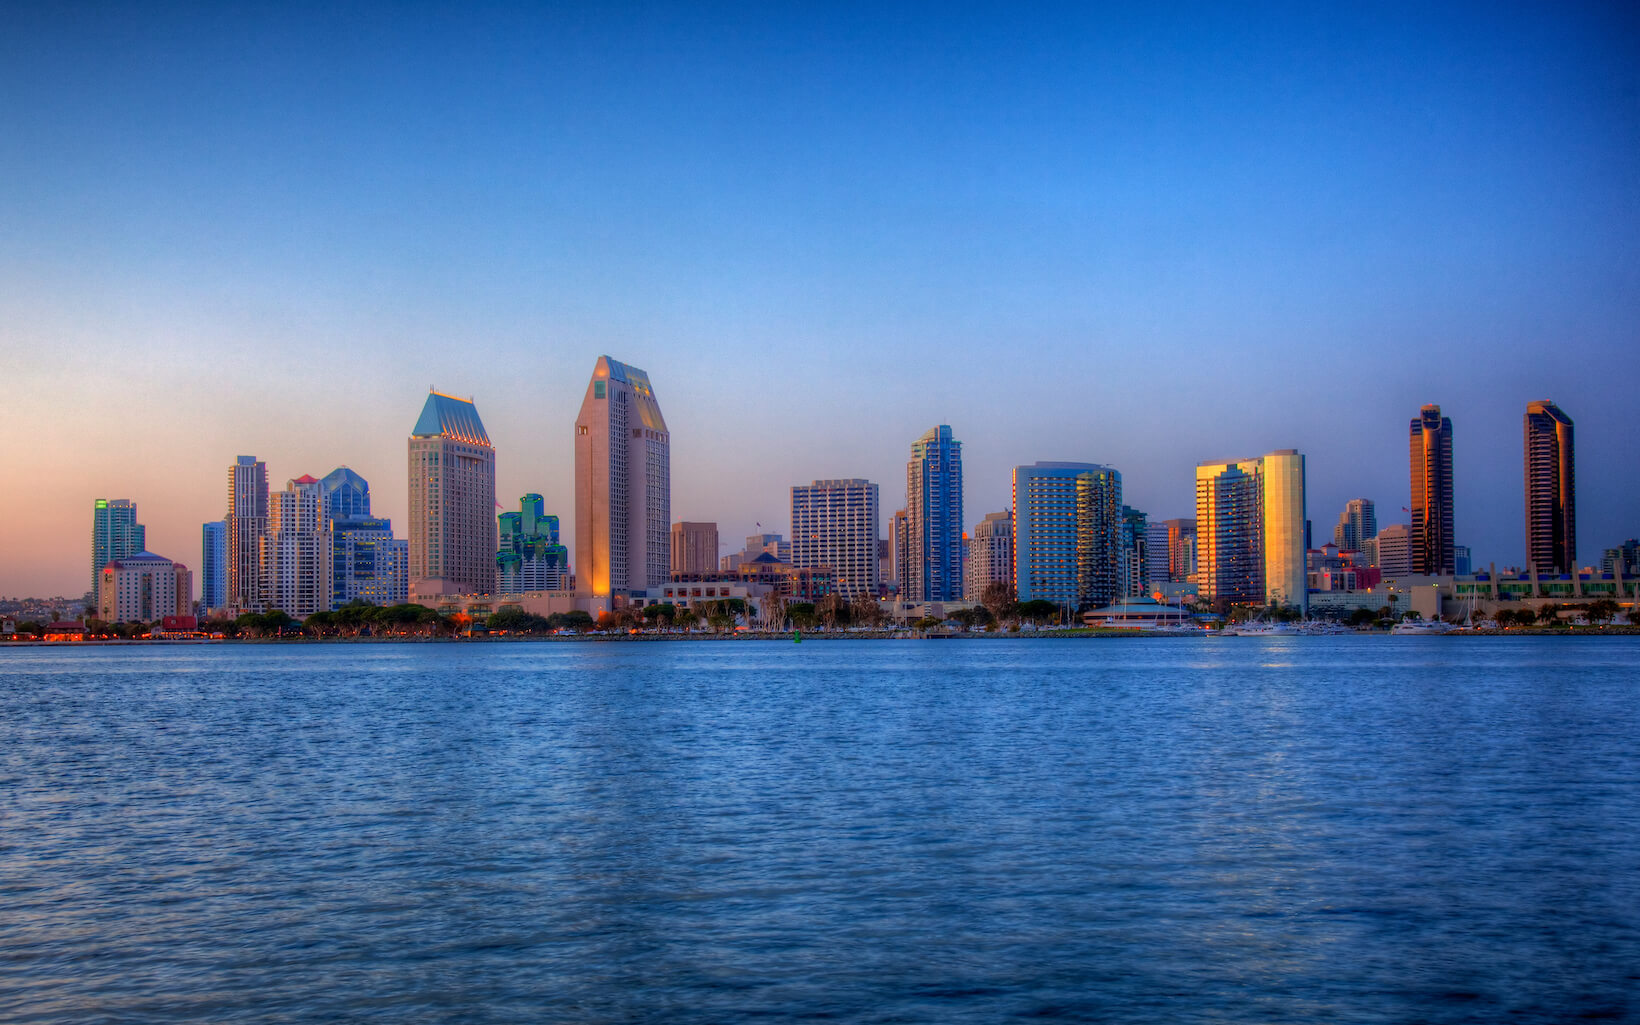 San Diego M&A advisory